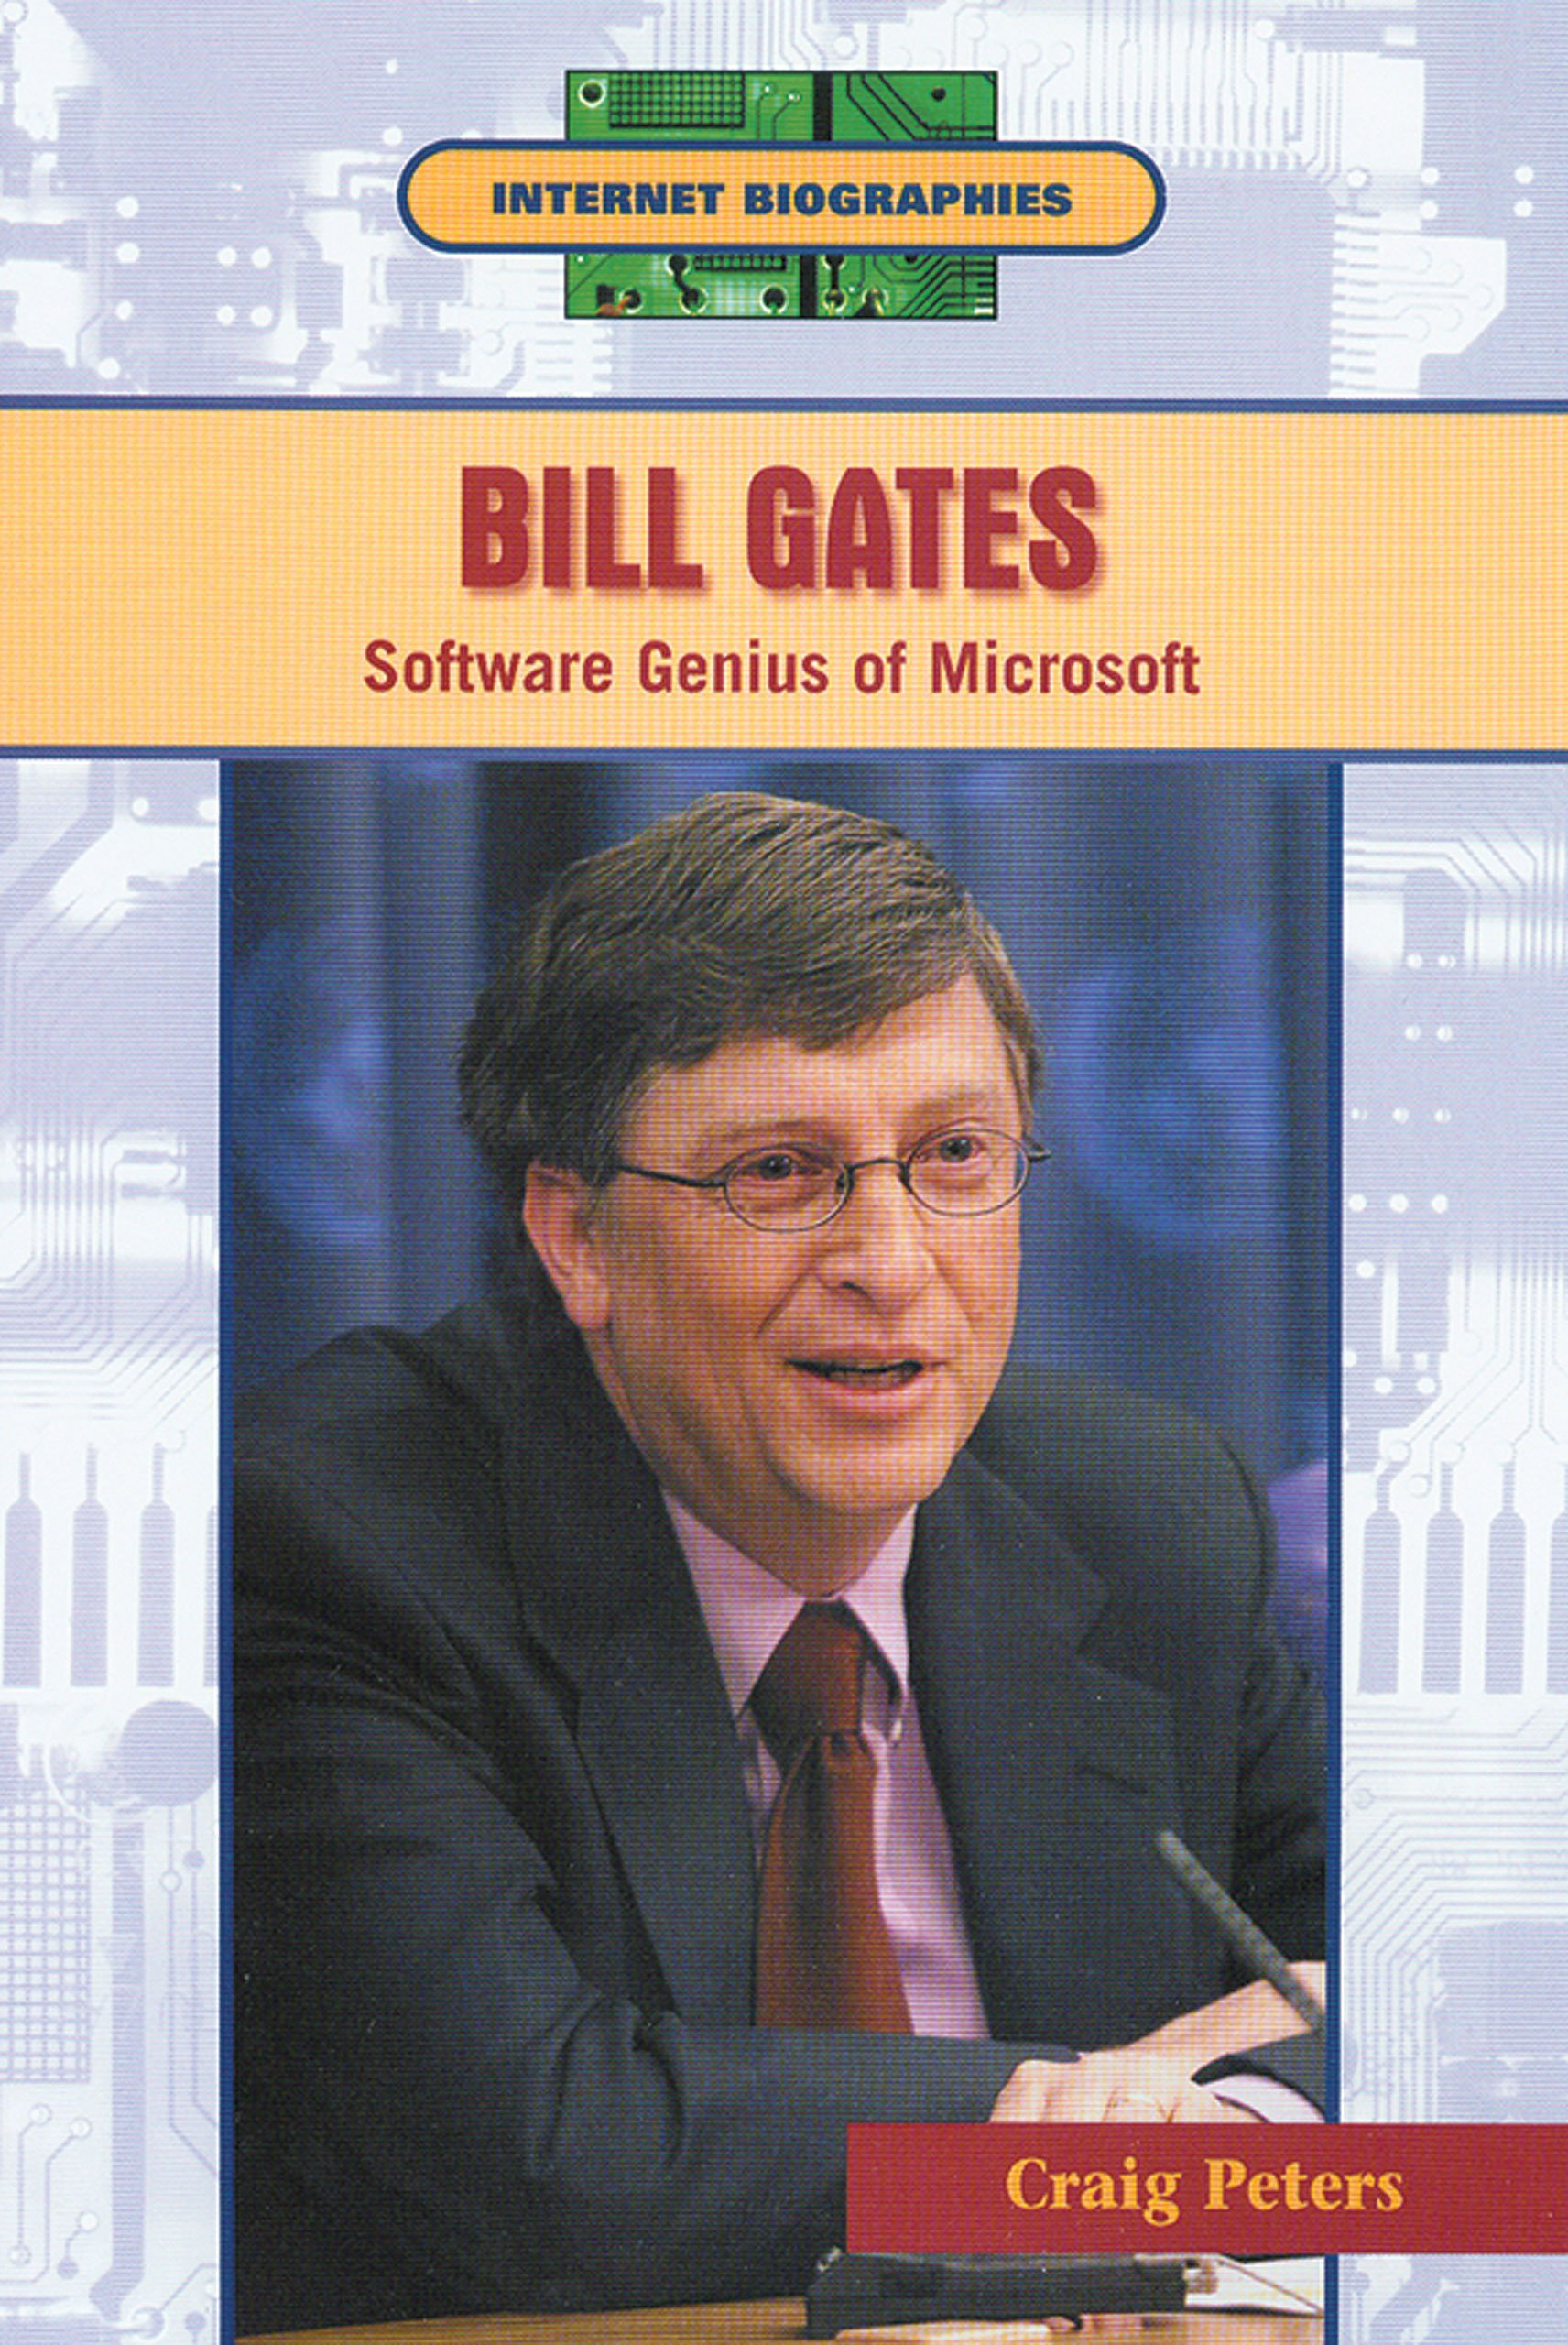 Bill Gates: Software Genius of Microsoft (Internet Biographies)